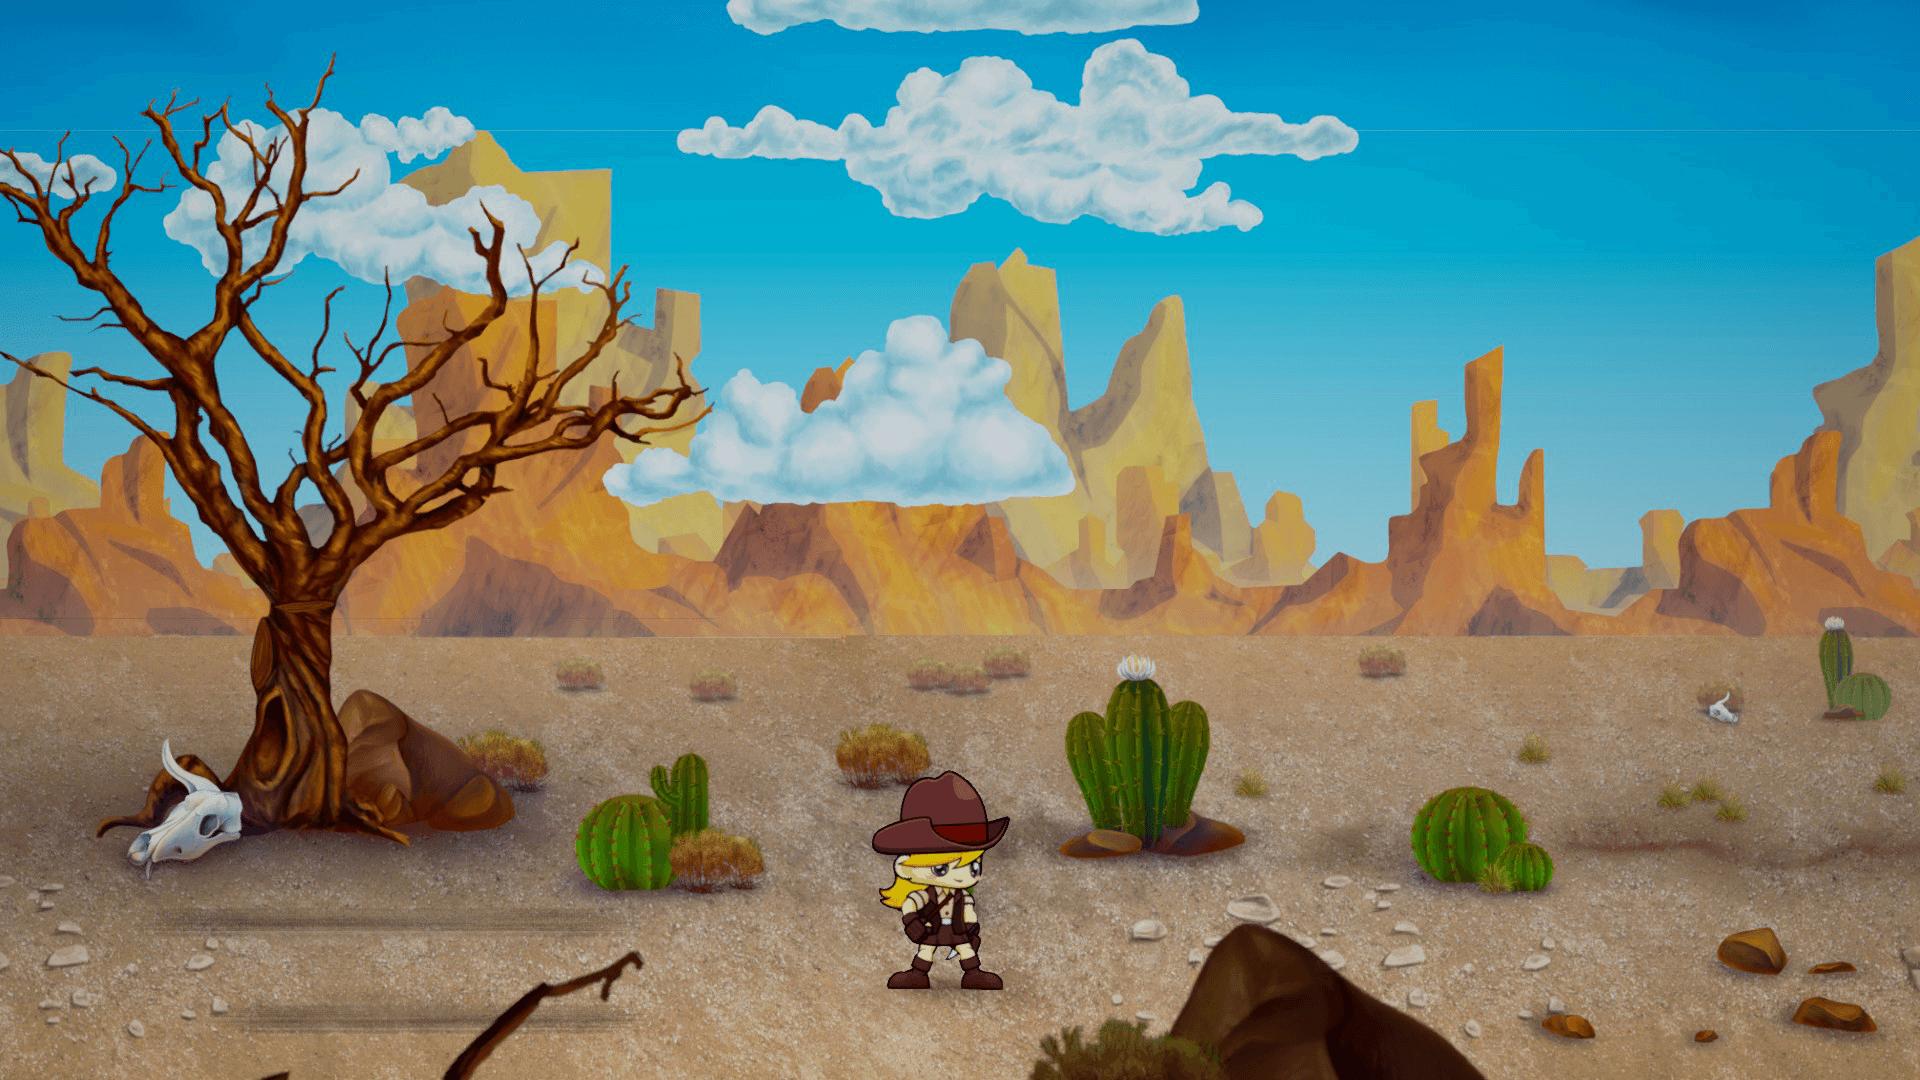 Desert 2D Platformer Pack by Games4Wonders in 2D Assets - UE4